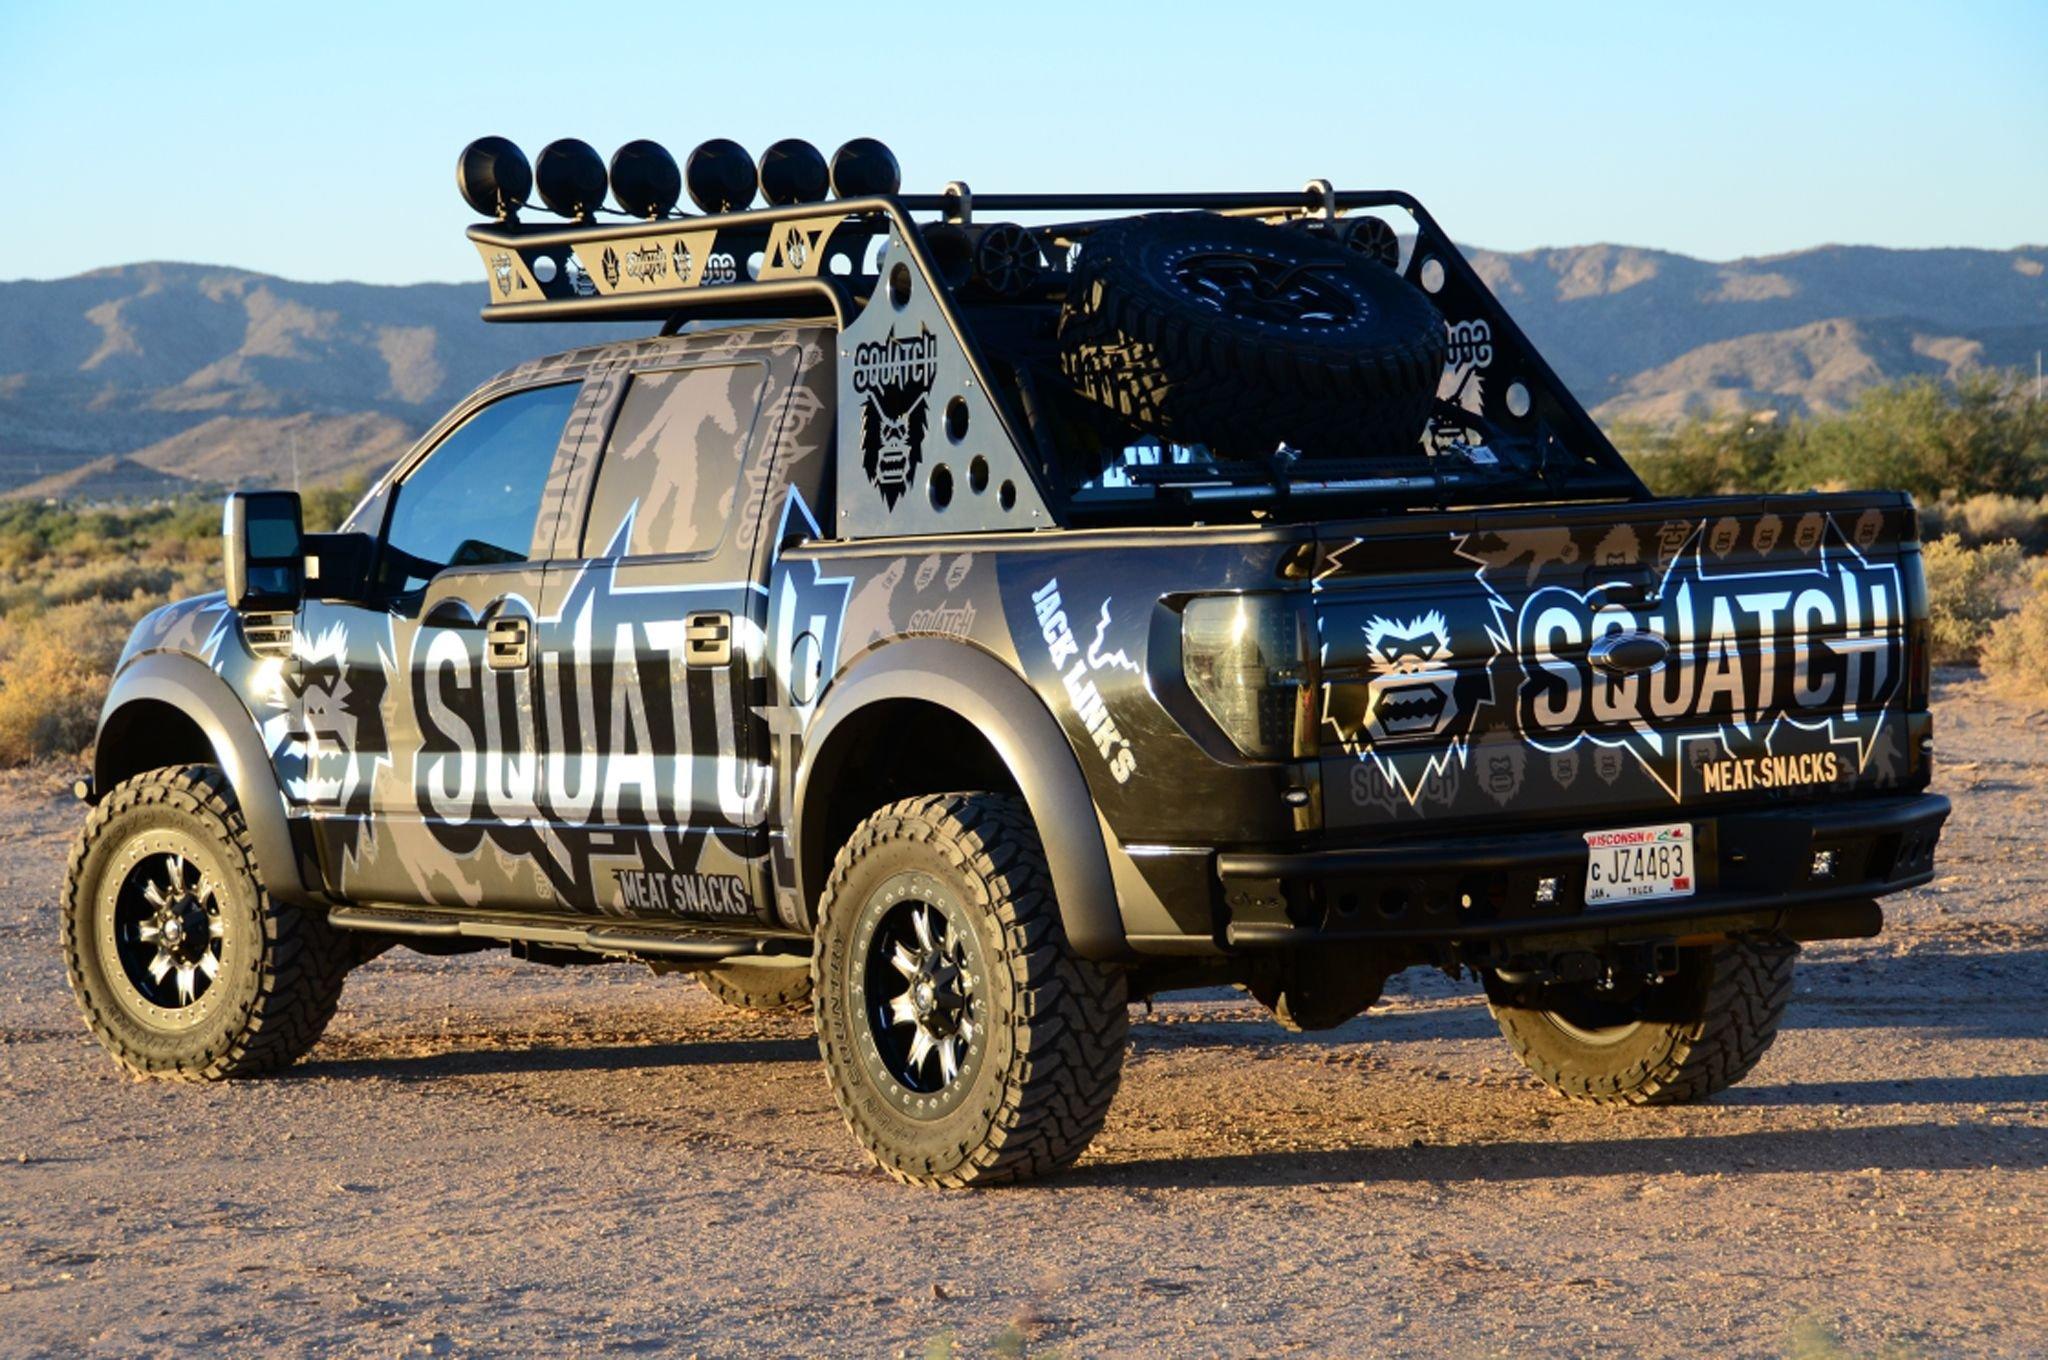 Ford F150 Forum >> 2012 Ford F-150 Raptor SVT muscle pickup custom tuning awd f150 wallpaper | 2048x1360 | 880243 ...